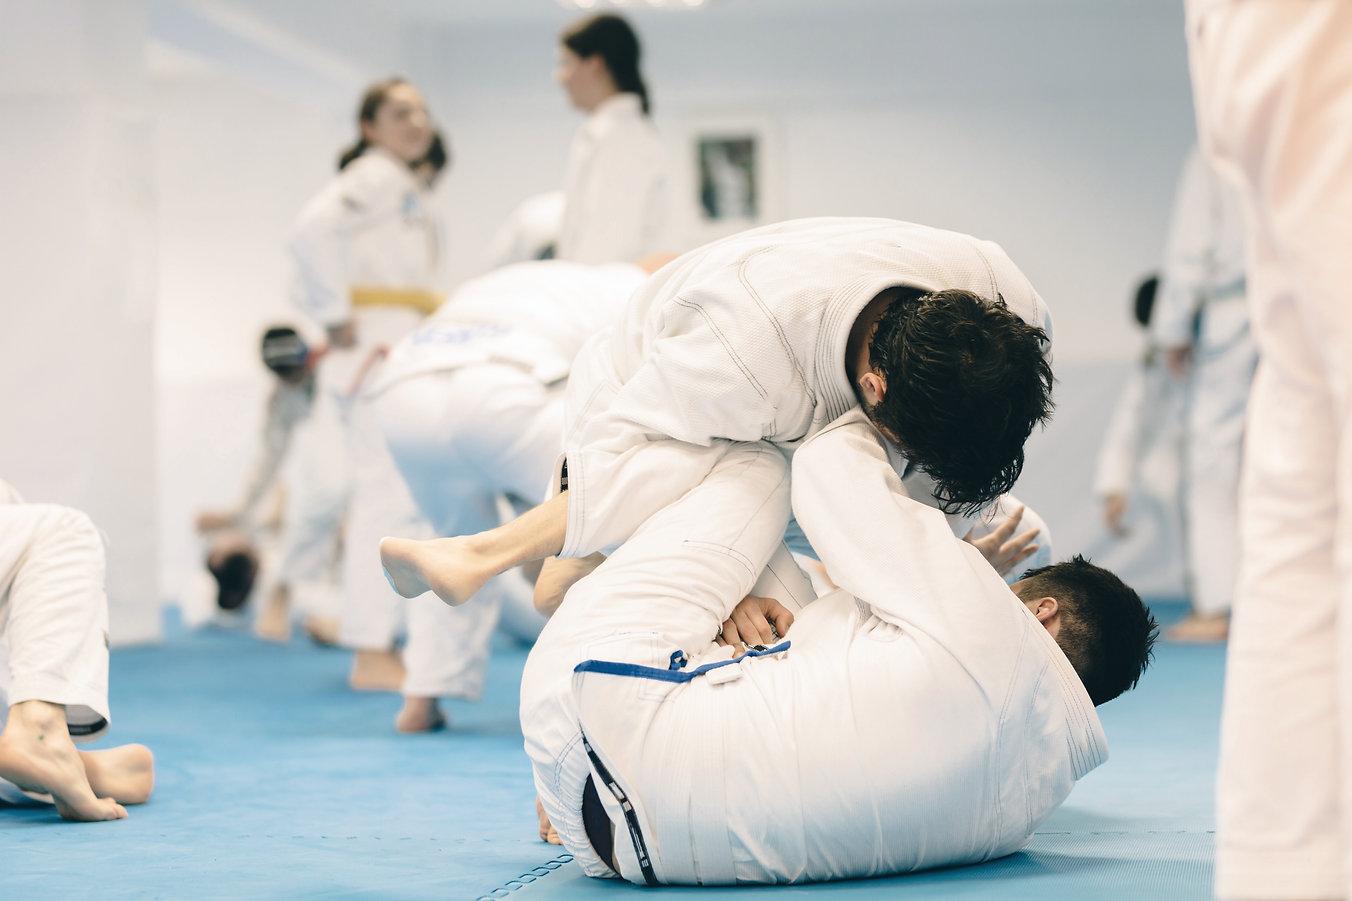 jiu-jitsu exercise training for martial